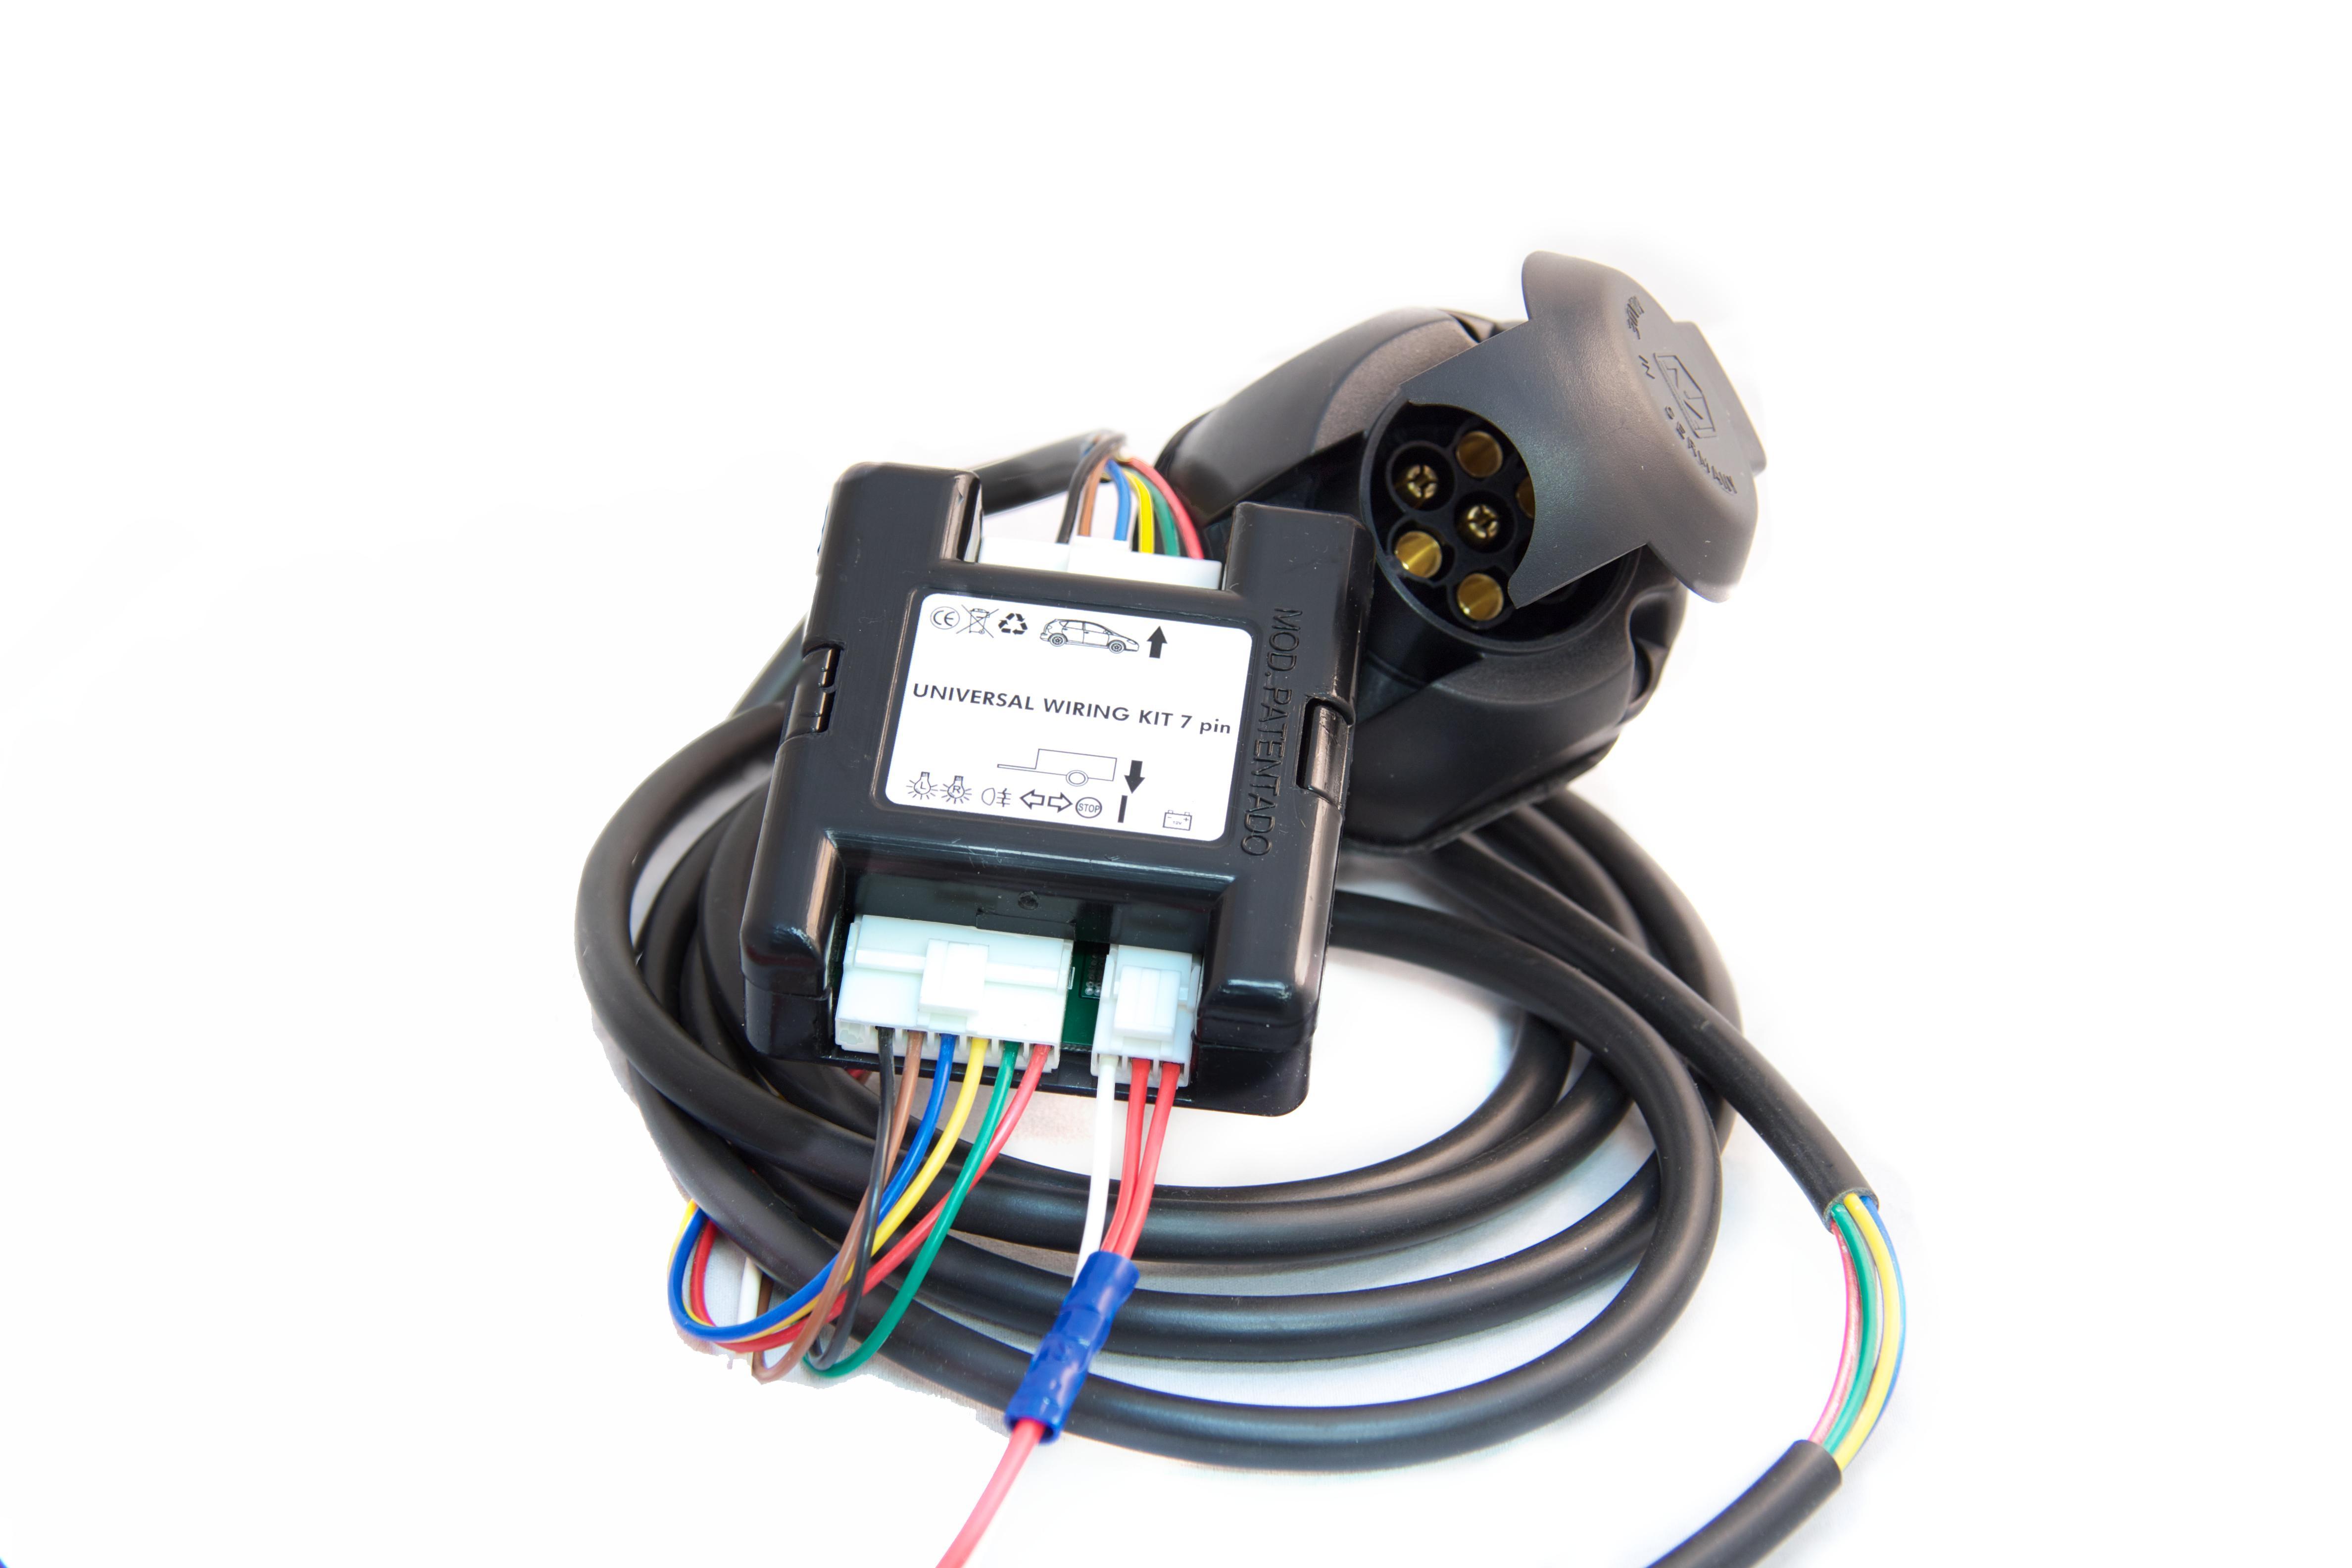 Universal Wiring Kit Pin Data Wiringeb844 Emerson 3 Hp Pool Spa Motor 208230 Vac 3450 Rpm 7 Solutions Rh Rausco Com Gdw